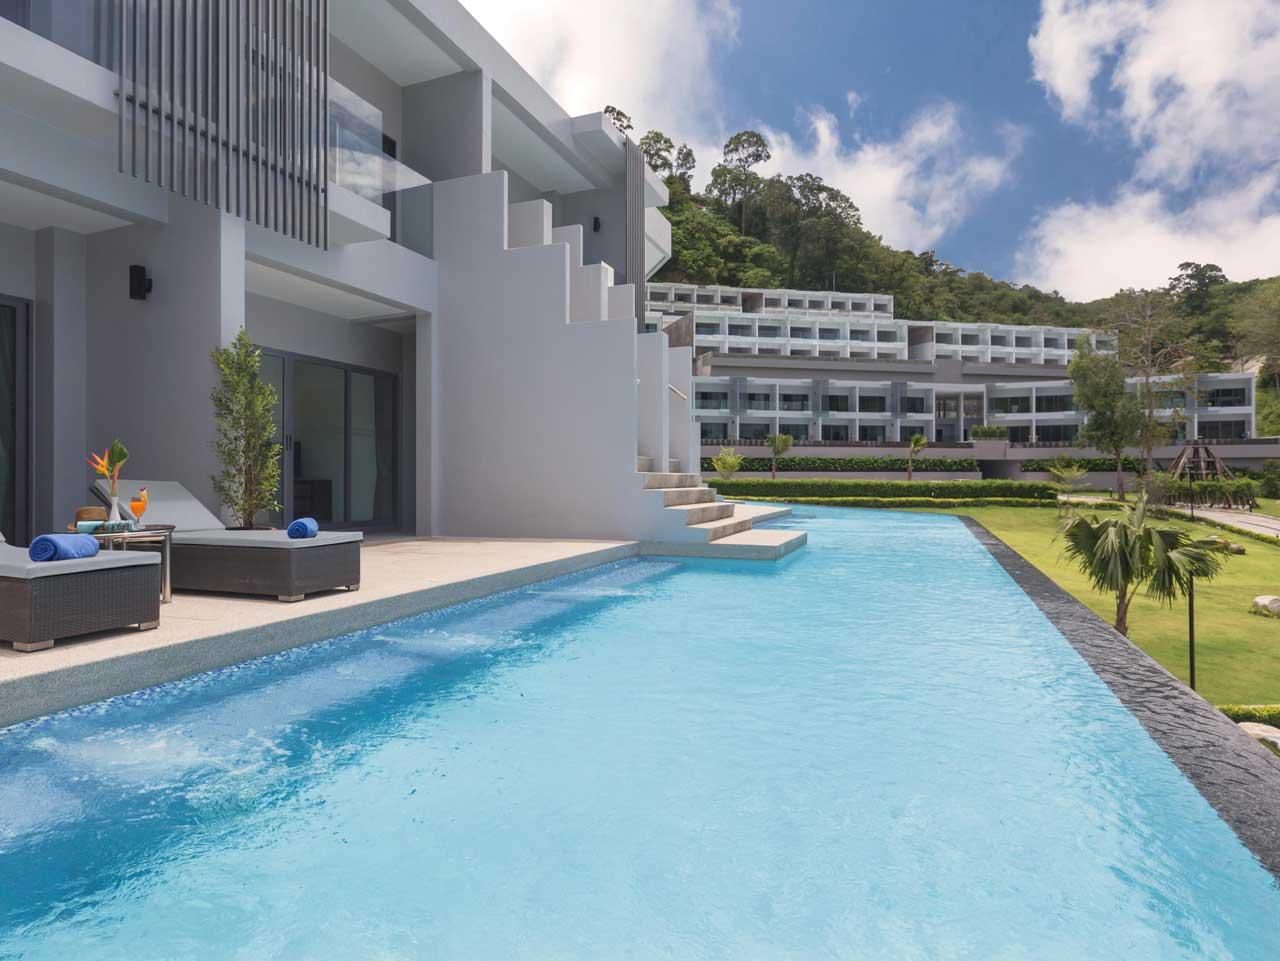 Phuket Holiday Service Real Estate Projects Phuket Thailand About Patong Bay Hill Resort2